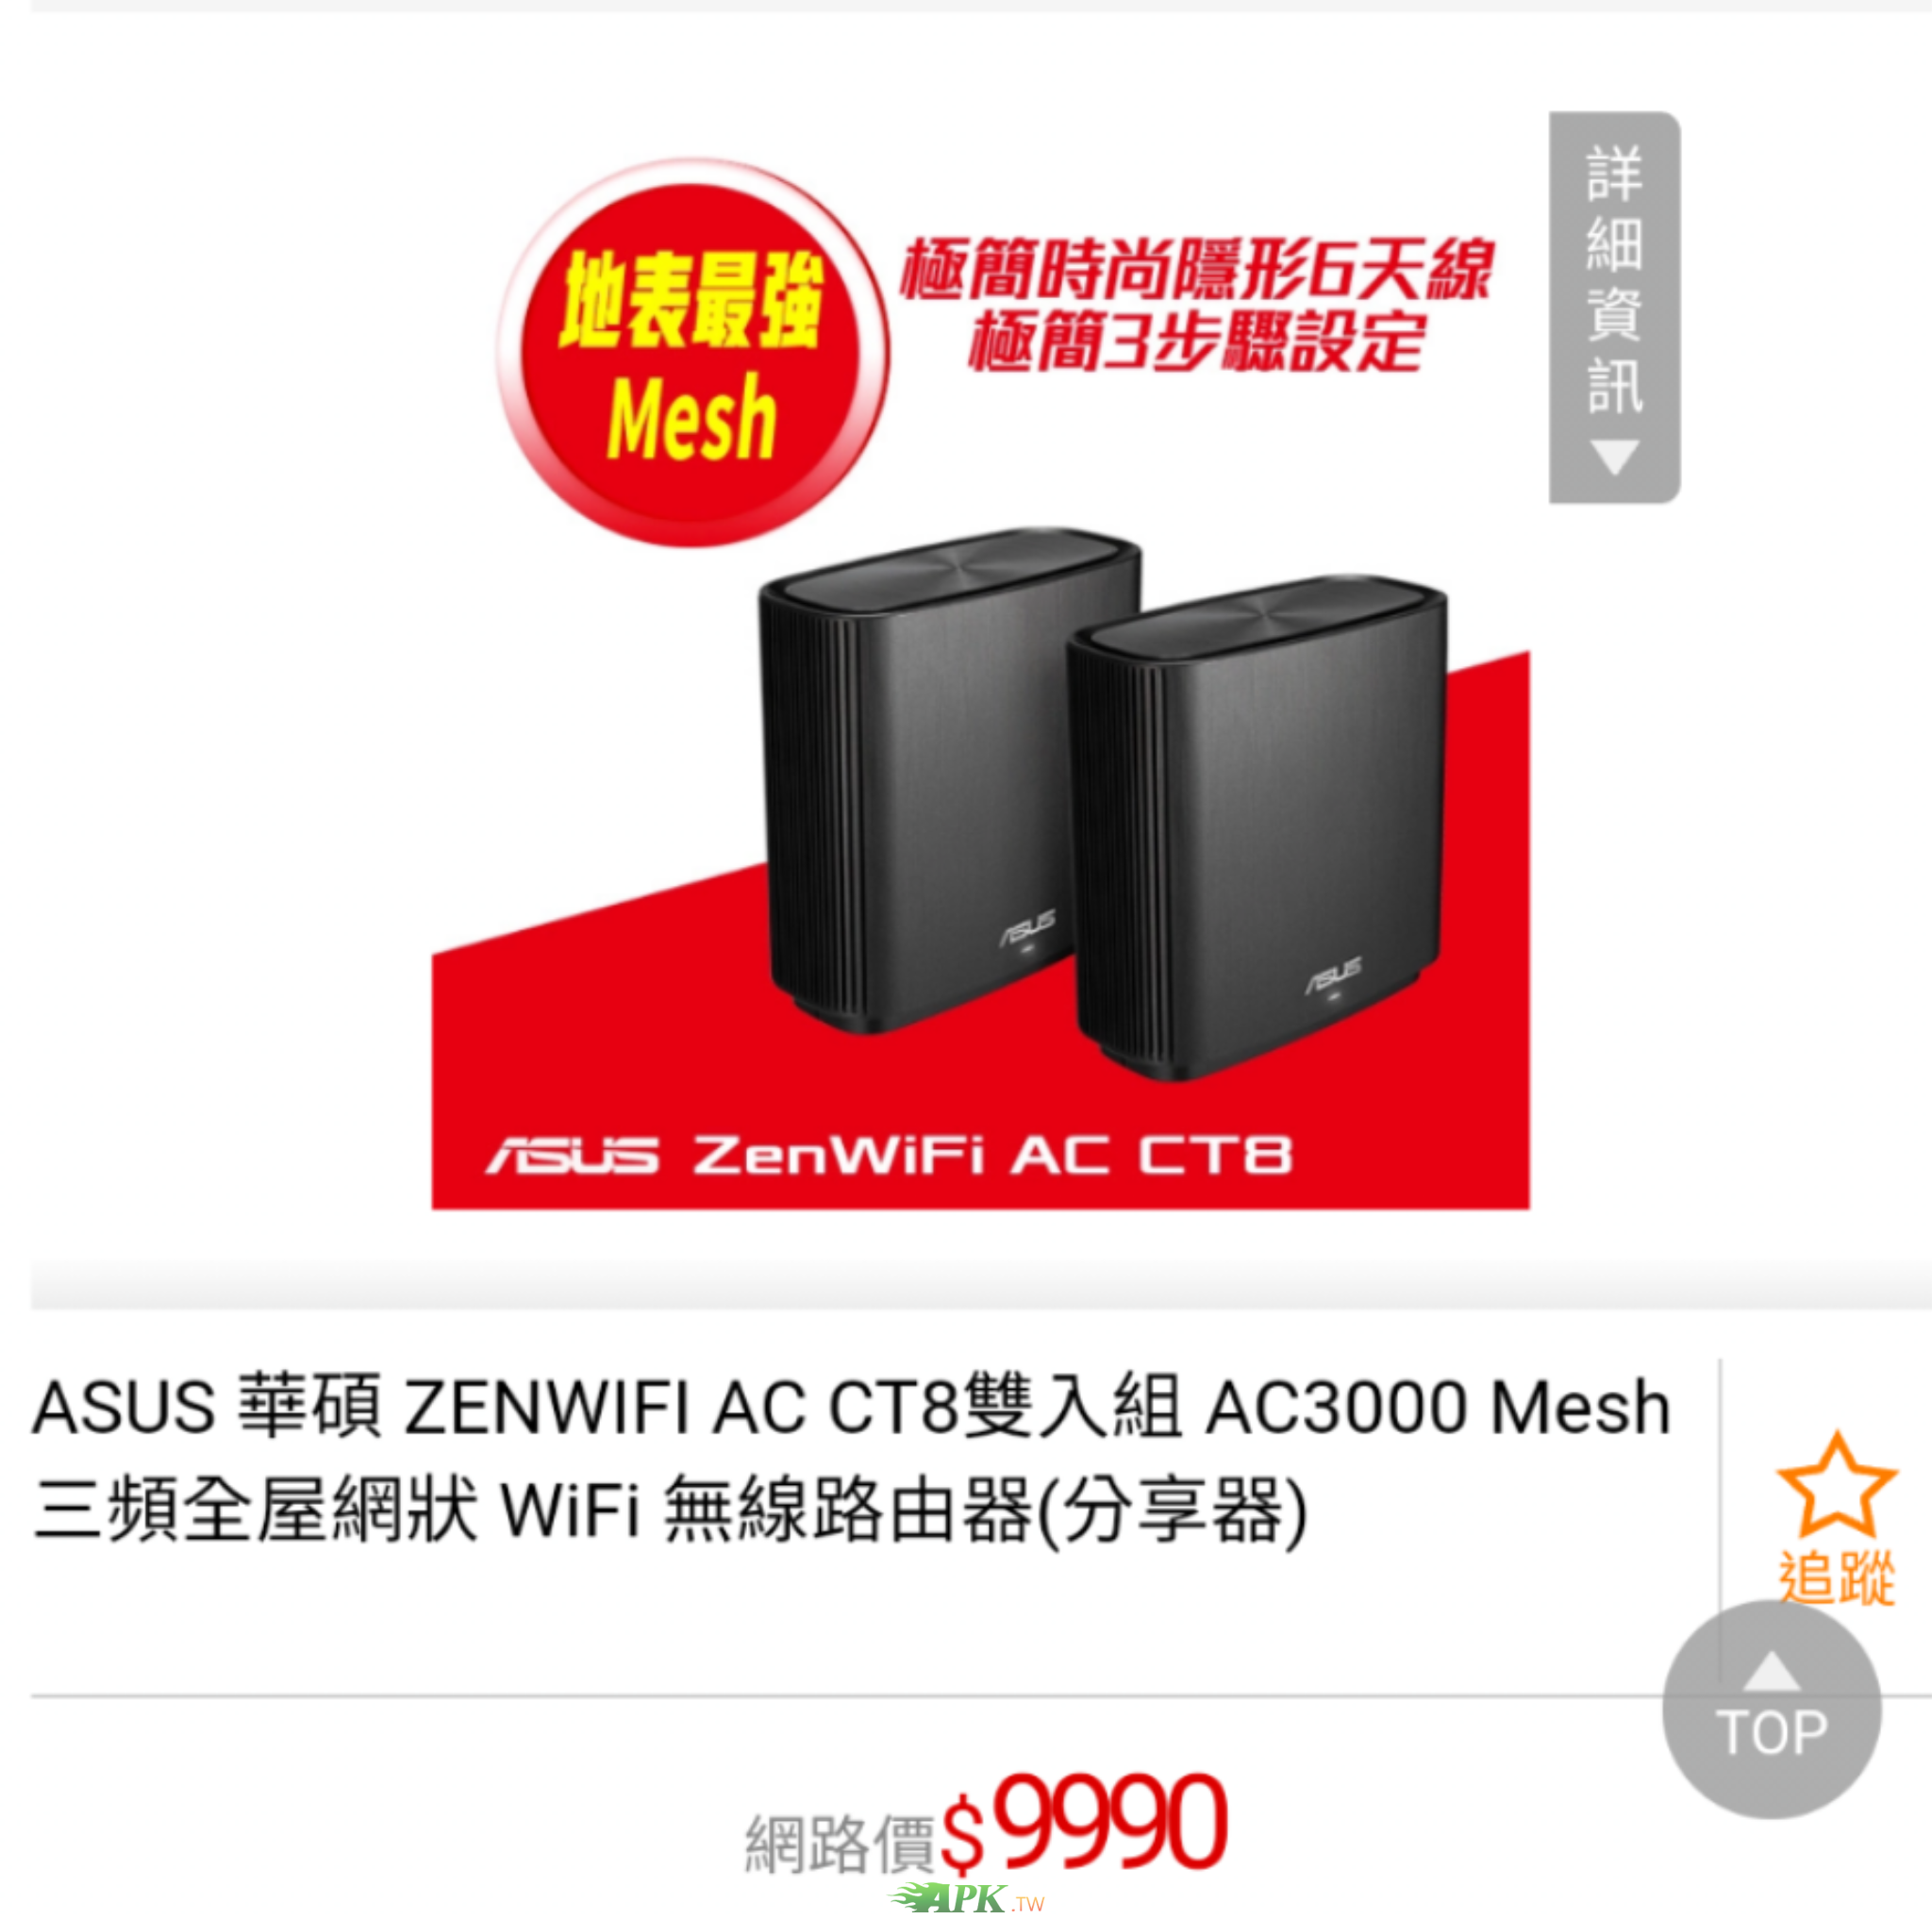 ZenWiFi AC CT8 AC3000 Mesh 三頻 只有一顆 4000元 限台南